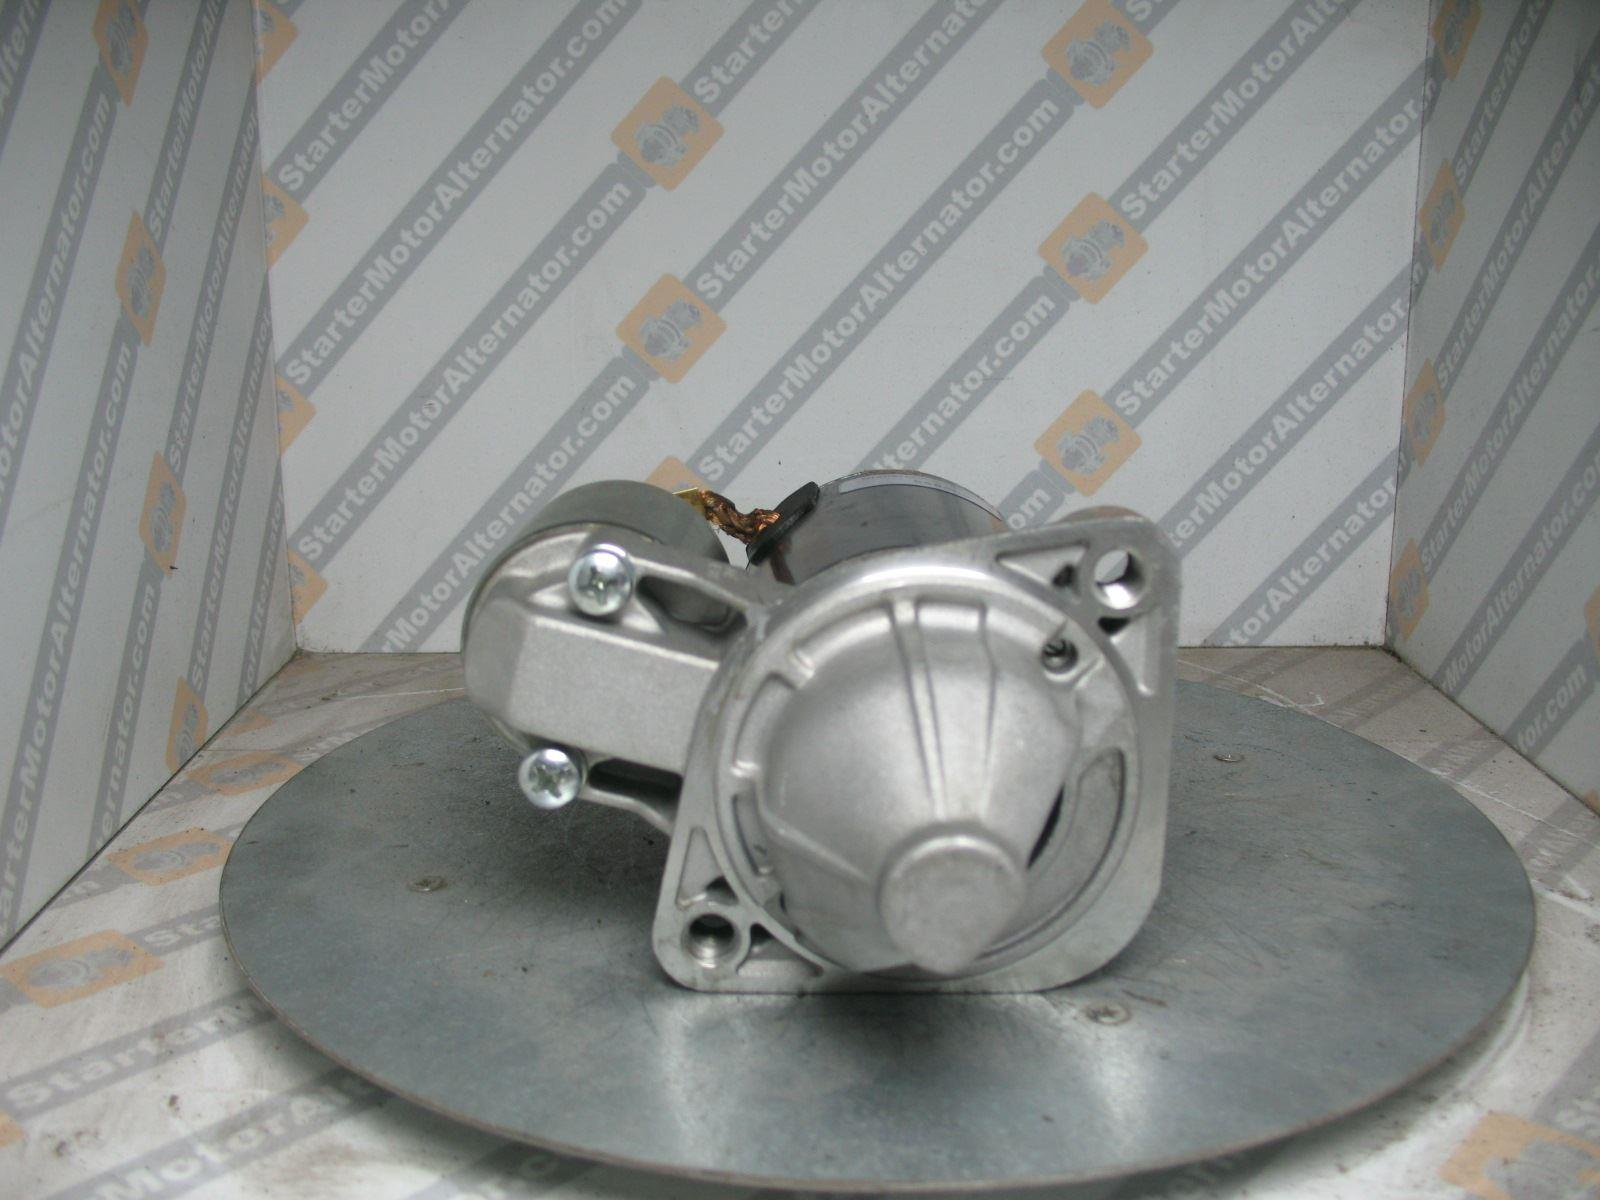 XIY2430 Starter Motor For Hyundai / Kia